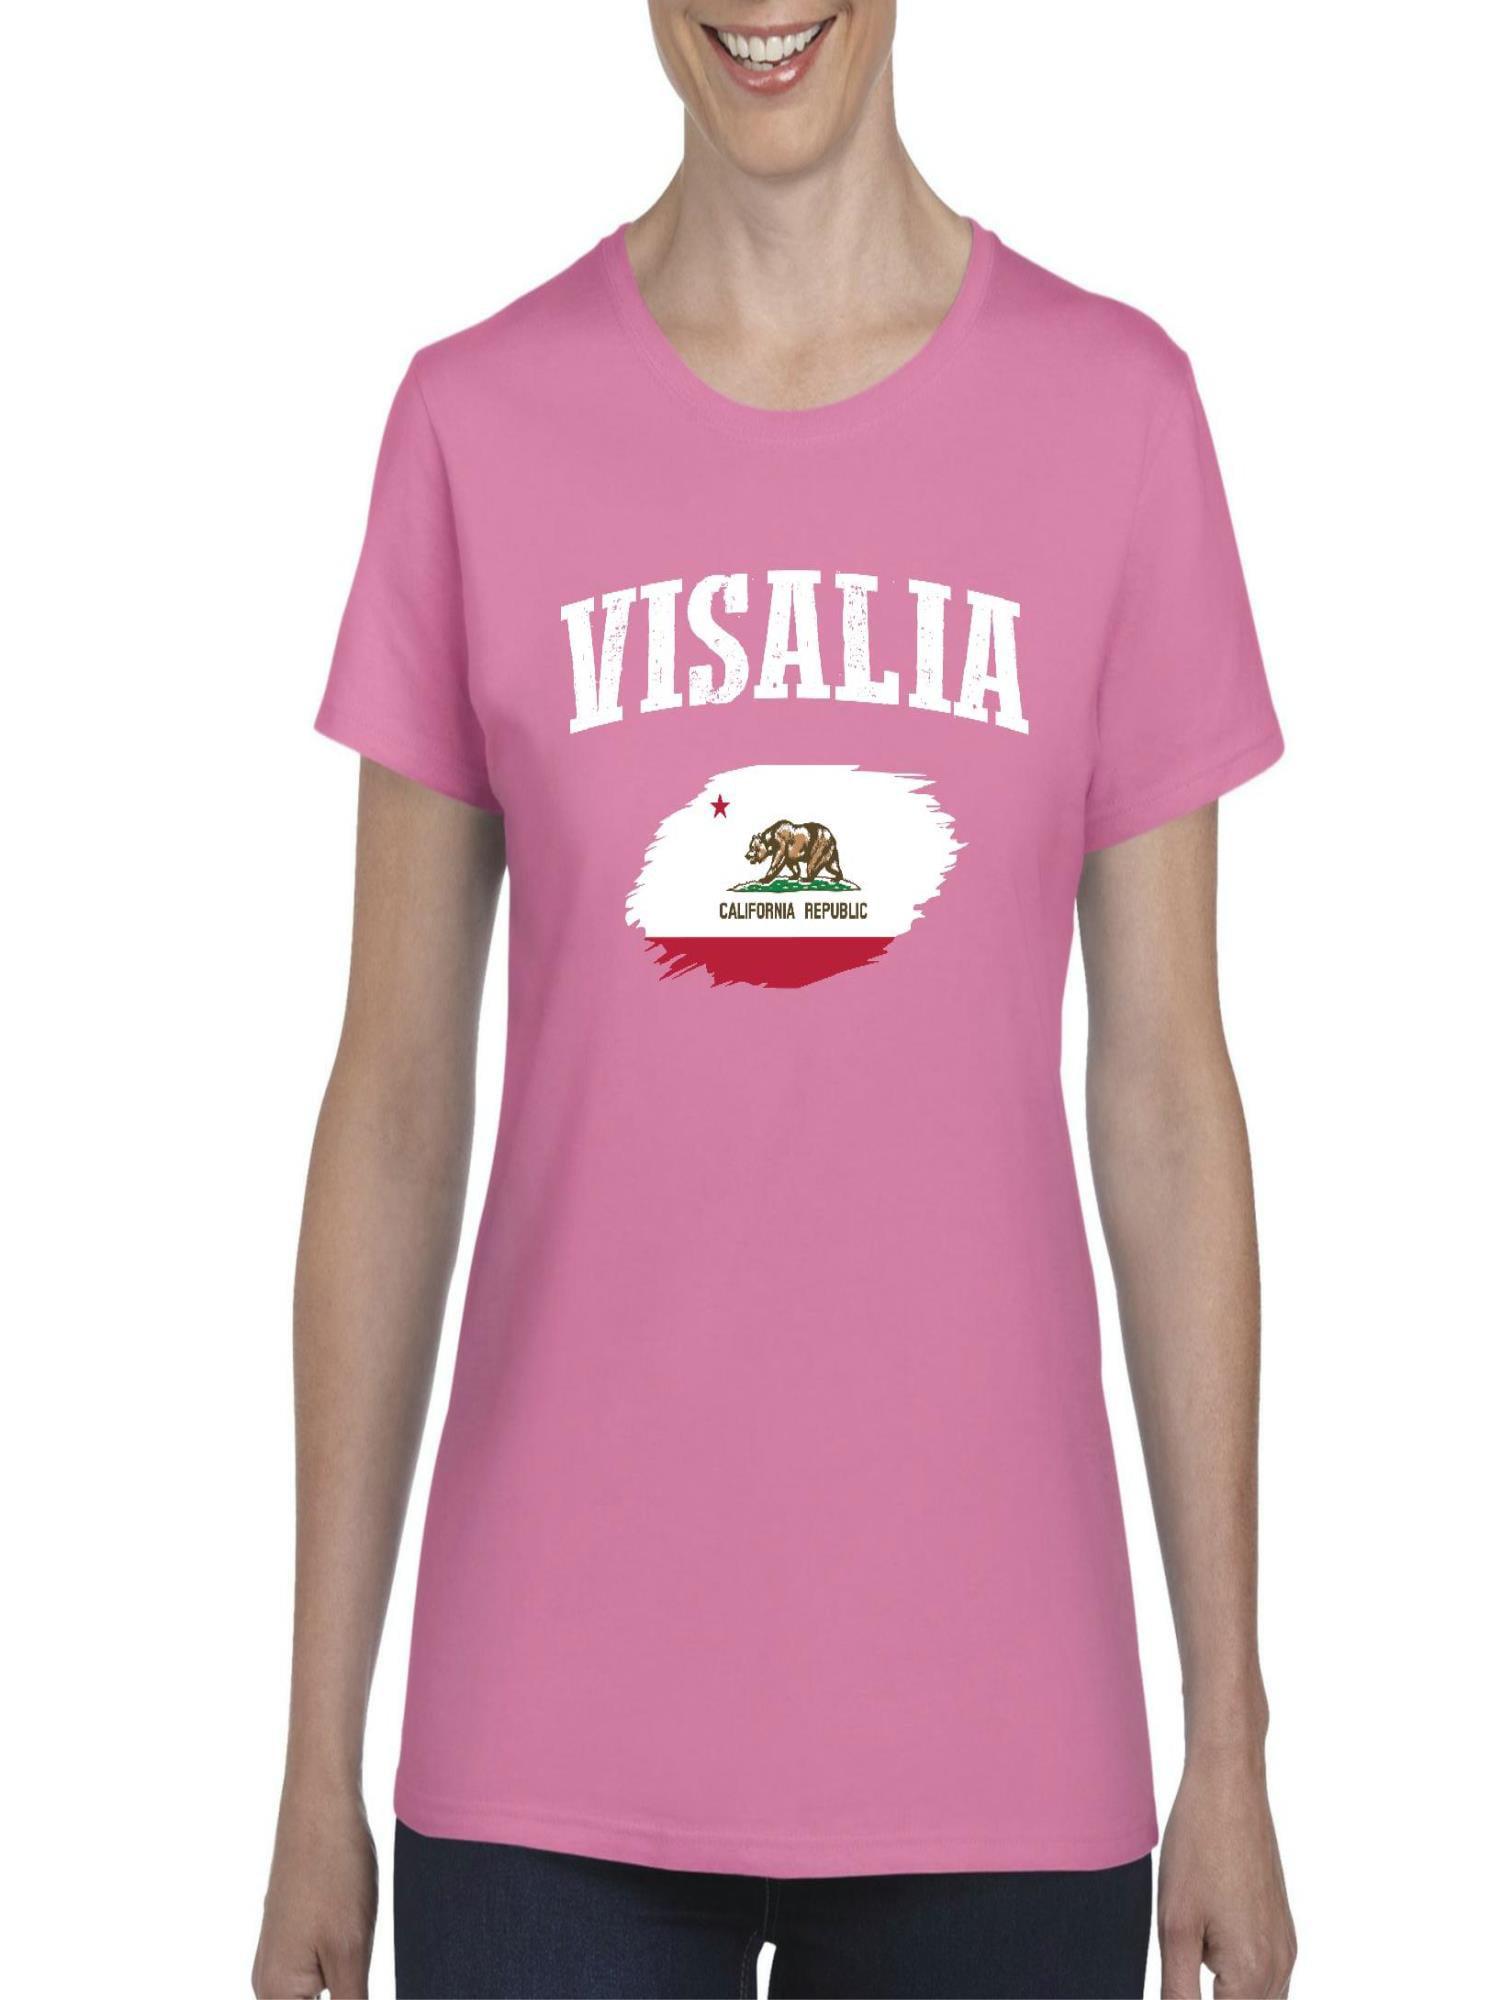 Normal Is Boring Visalia California Women Shirts T Shirt Tee